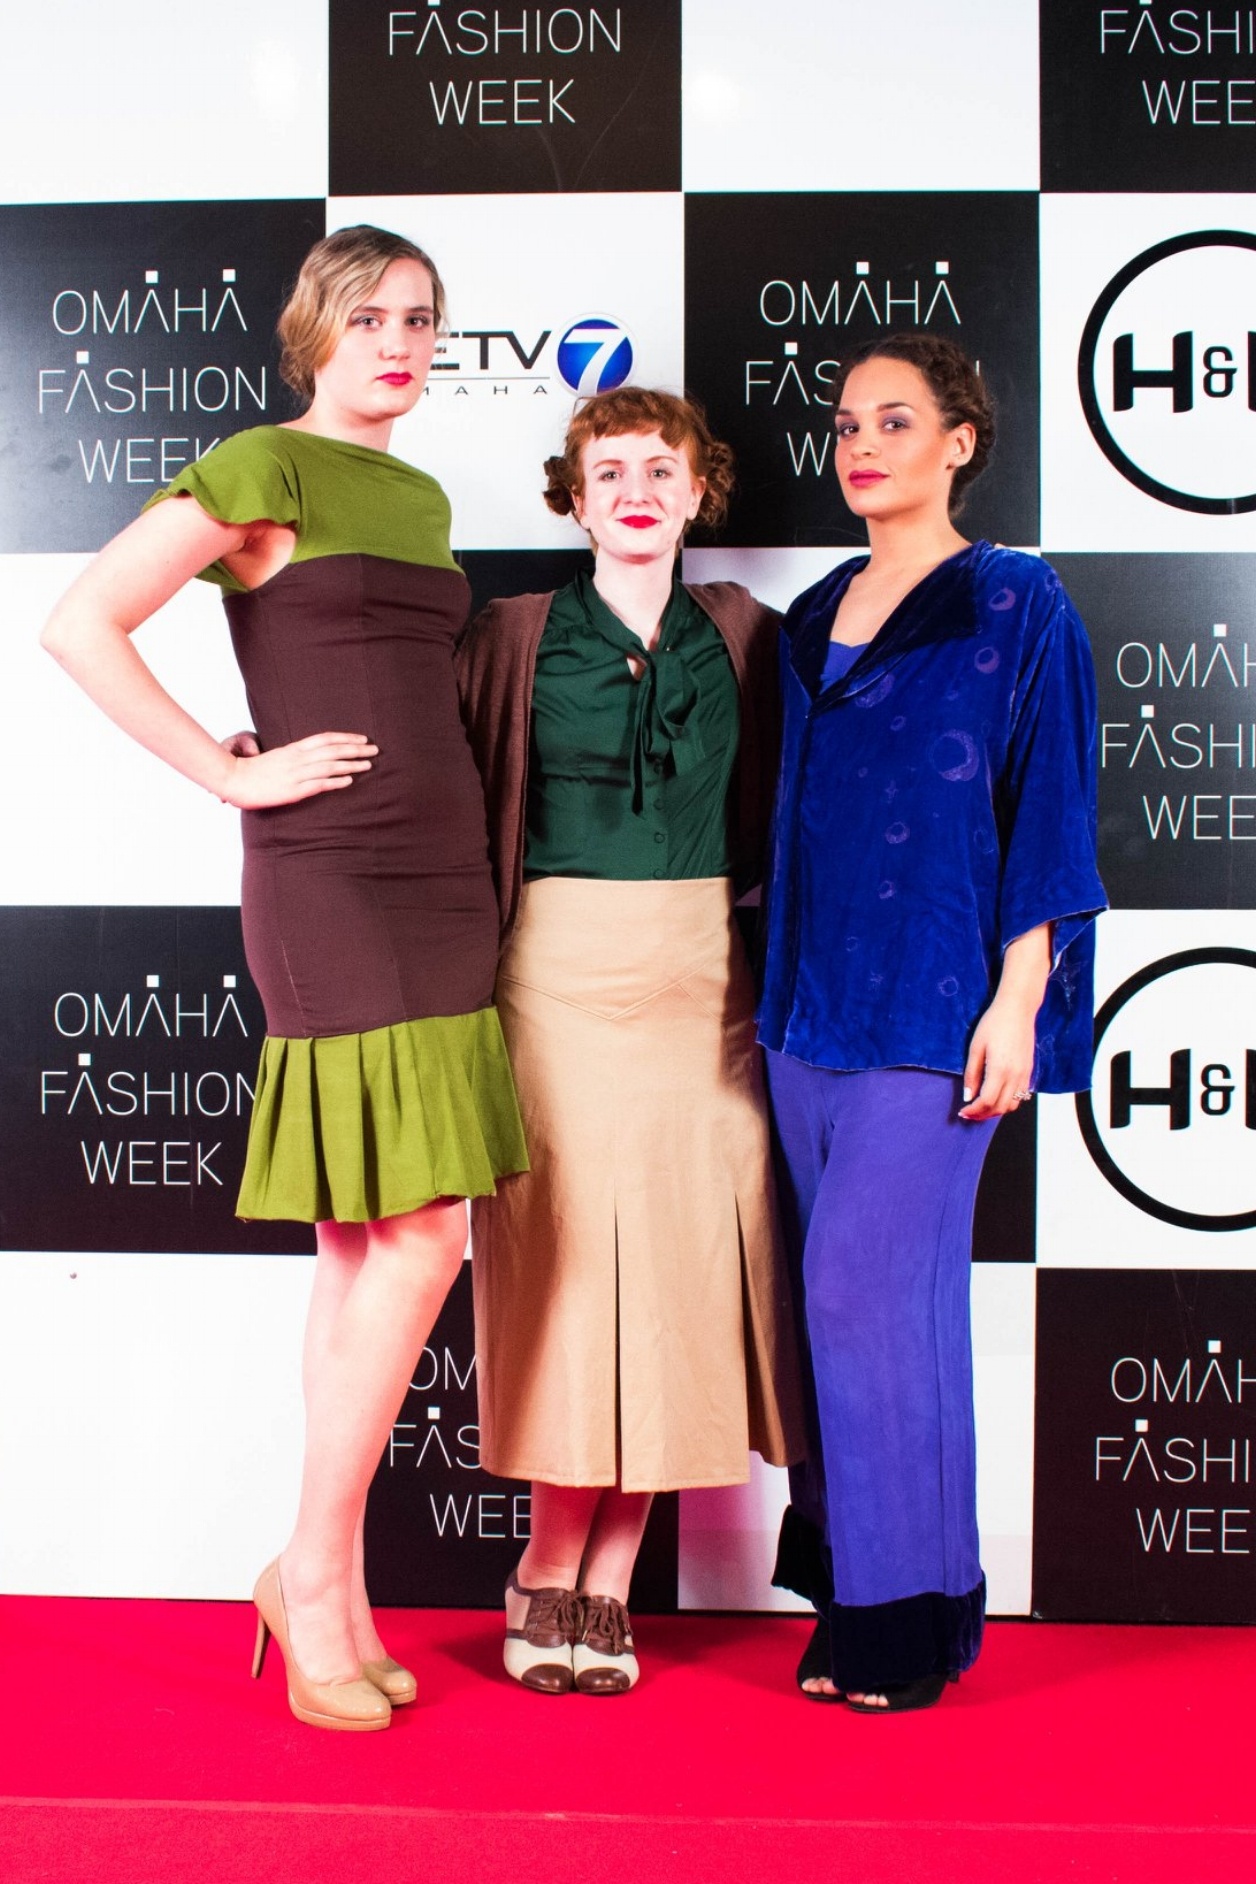 On the Borsheims Red Carpet during the UNL Student Showcase. (L to R:Lauren Dunn, Kate Lavender, Samantha Salinas